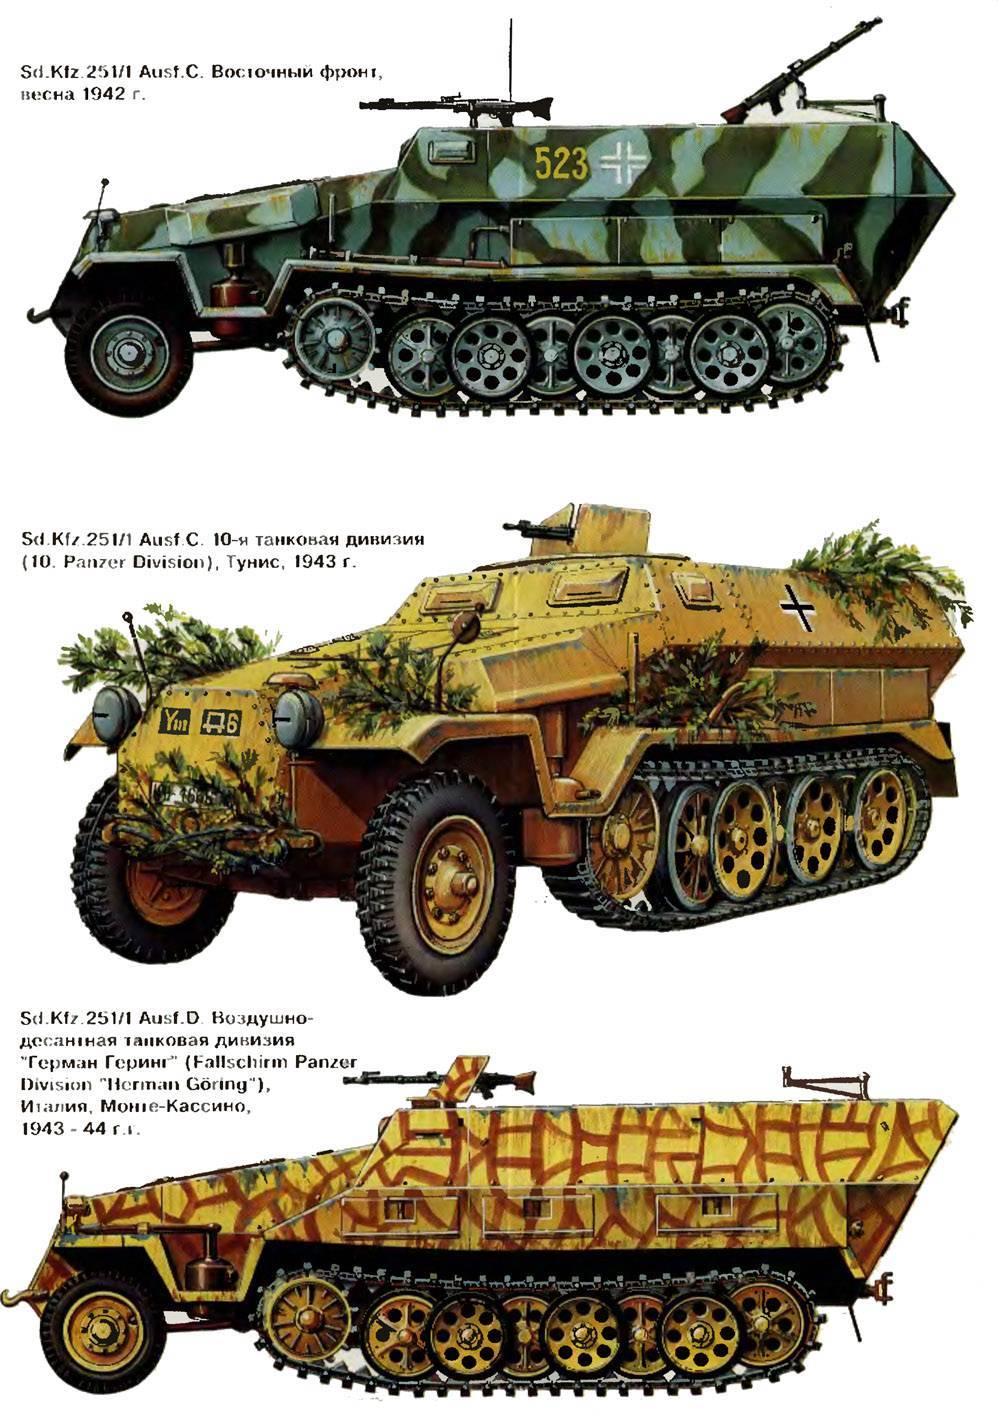 Бронетранспортер «hanomag» («ганомаг») sd.kfz.251 | армии и солдаты. военная энциклопедия